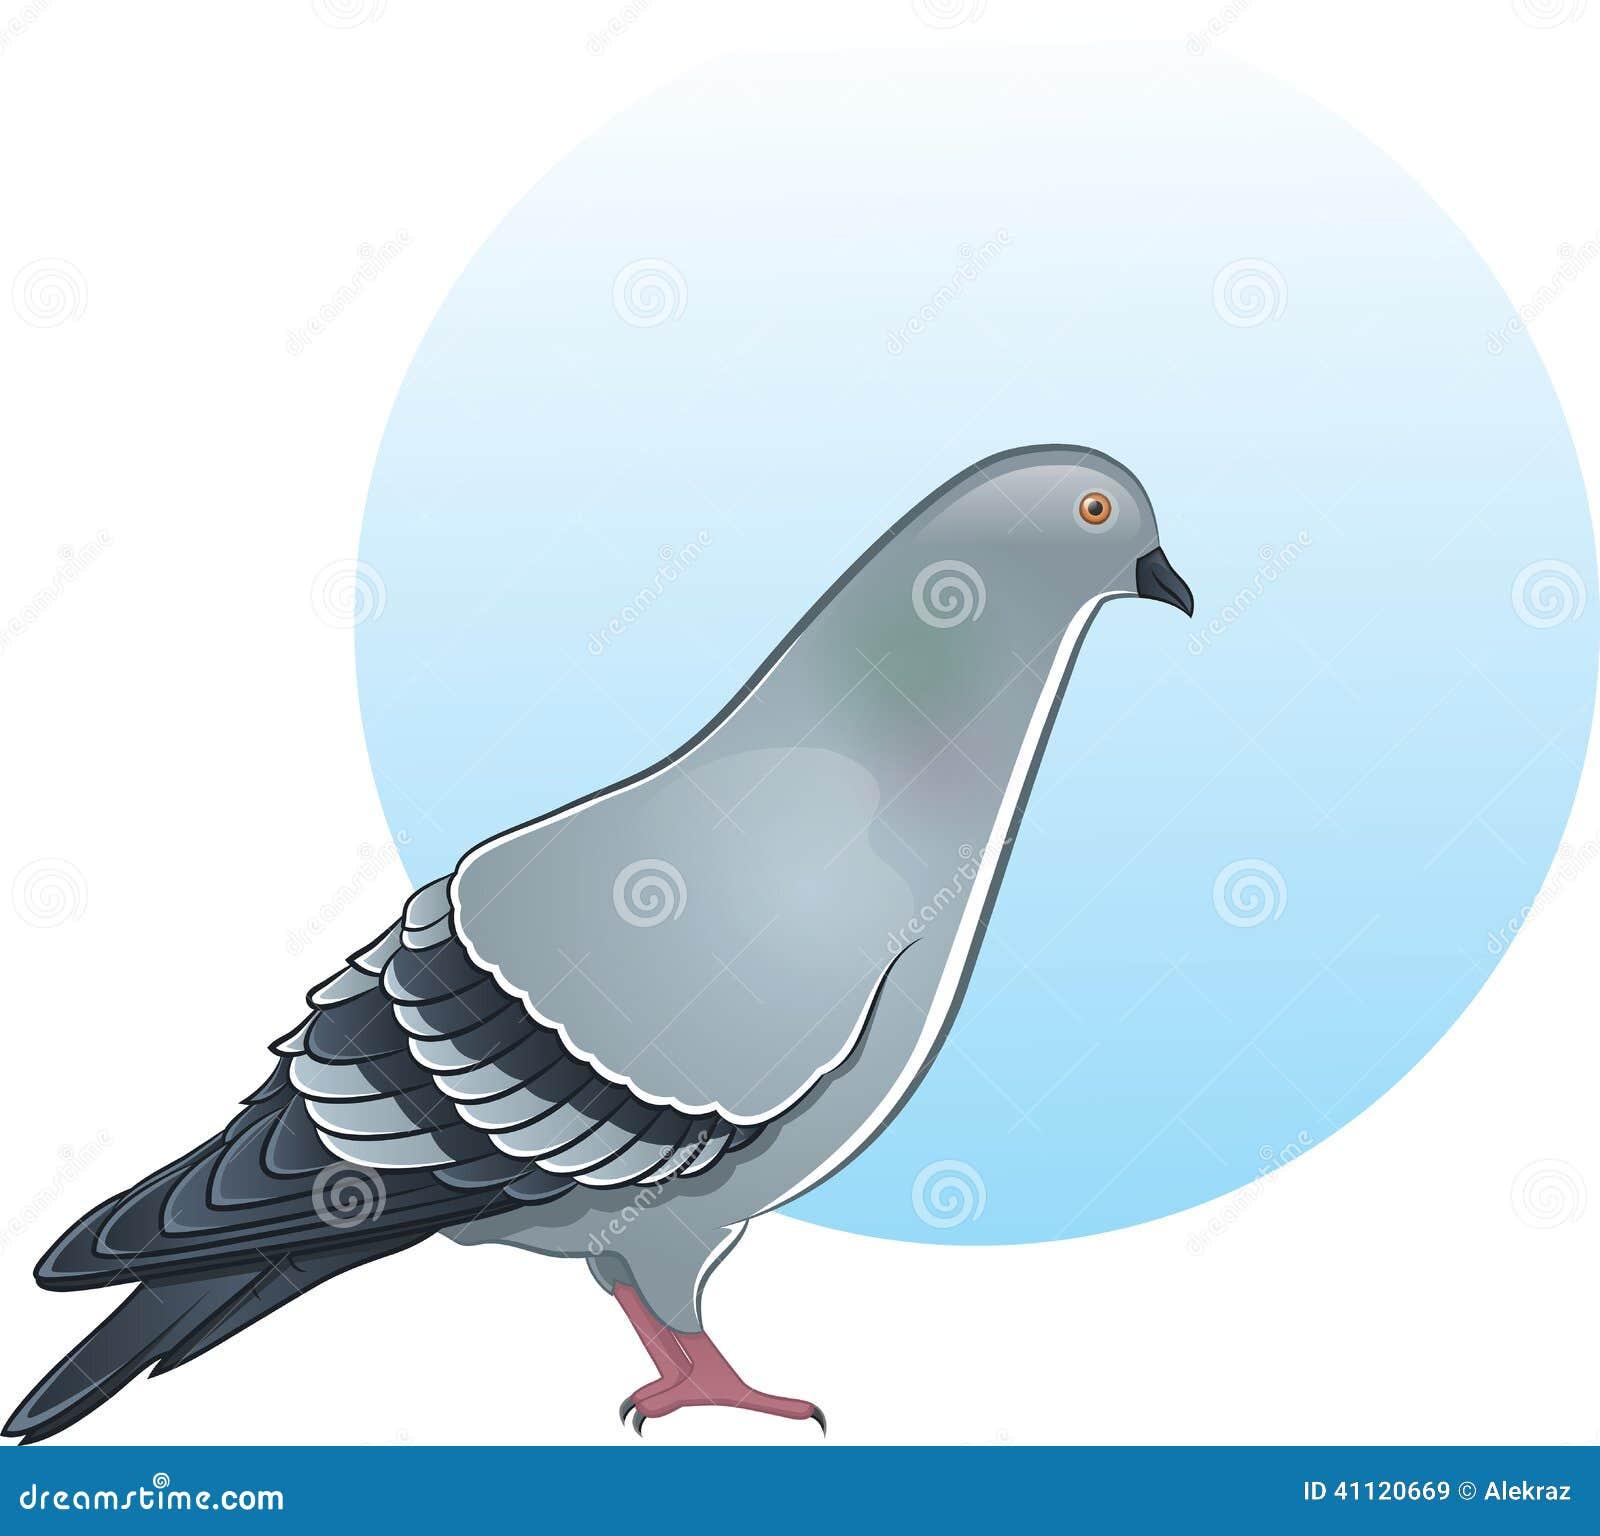 Cute Pigeon Illustration Stock Vector Image 41120669